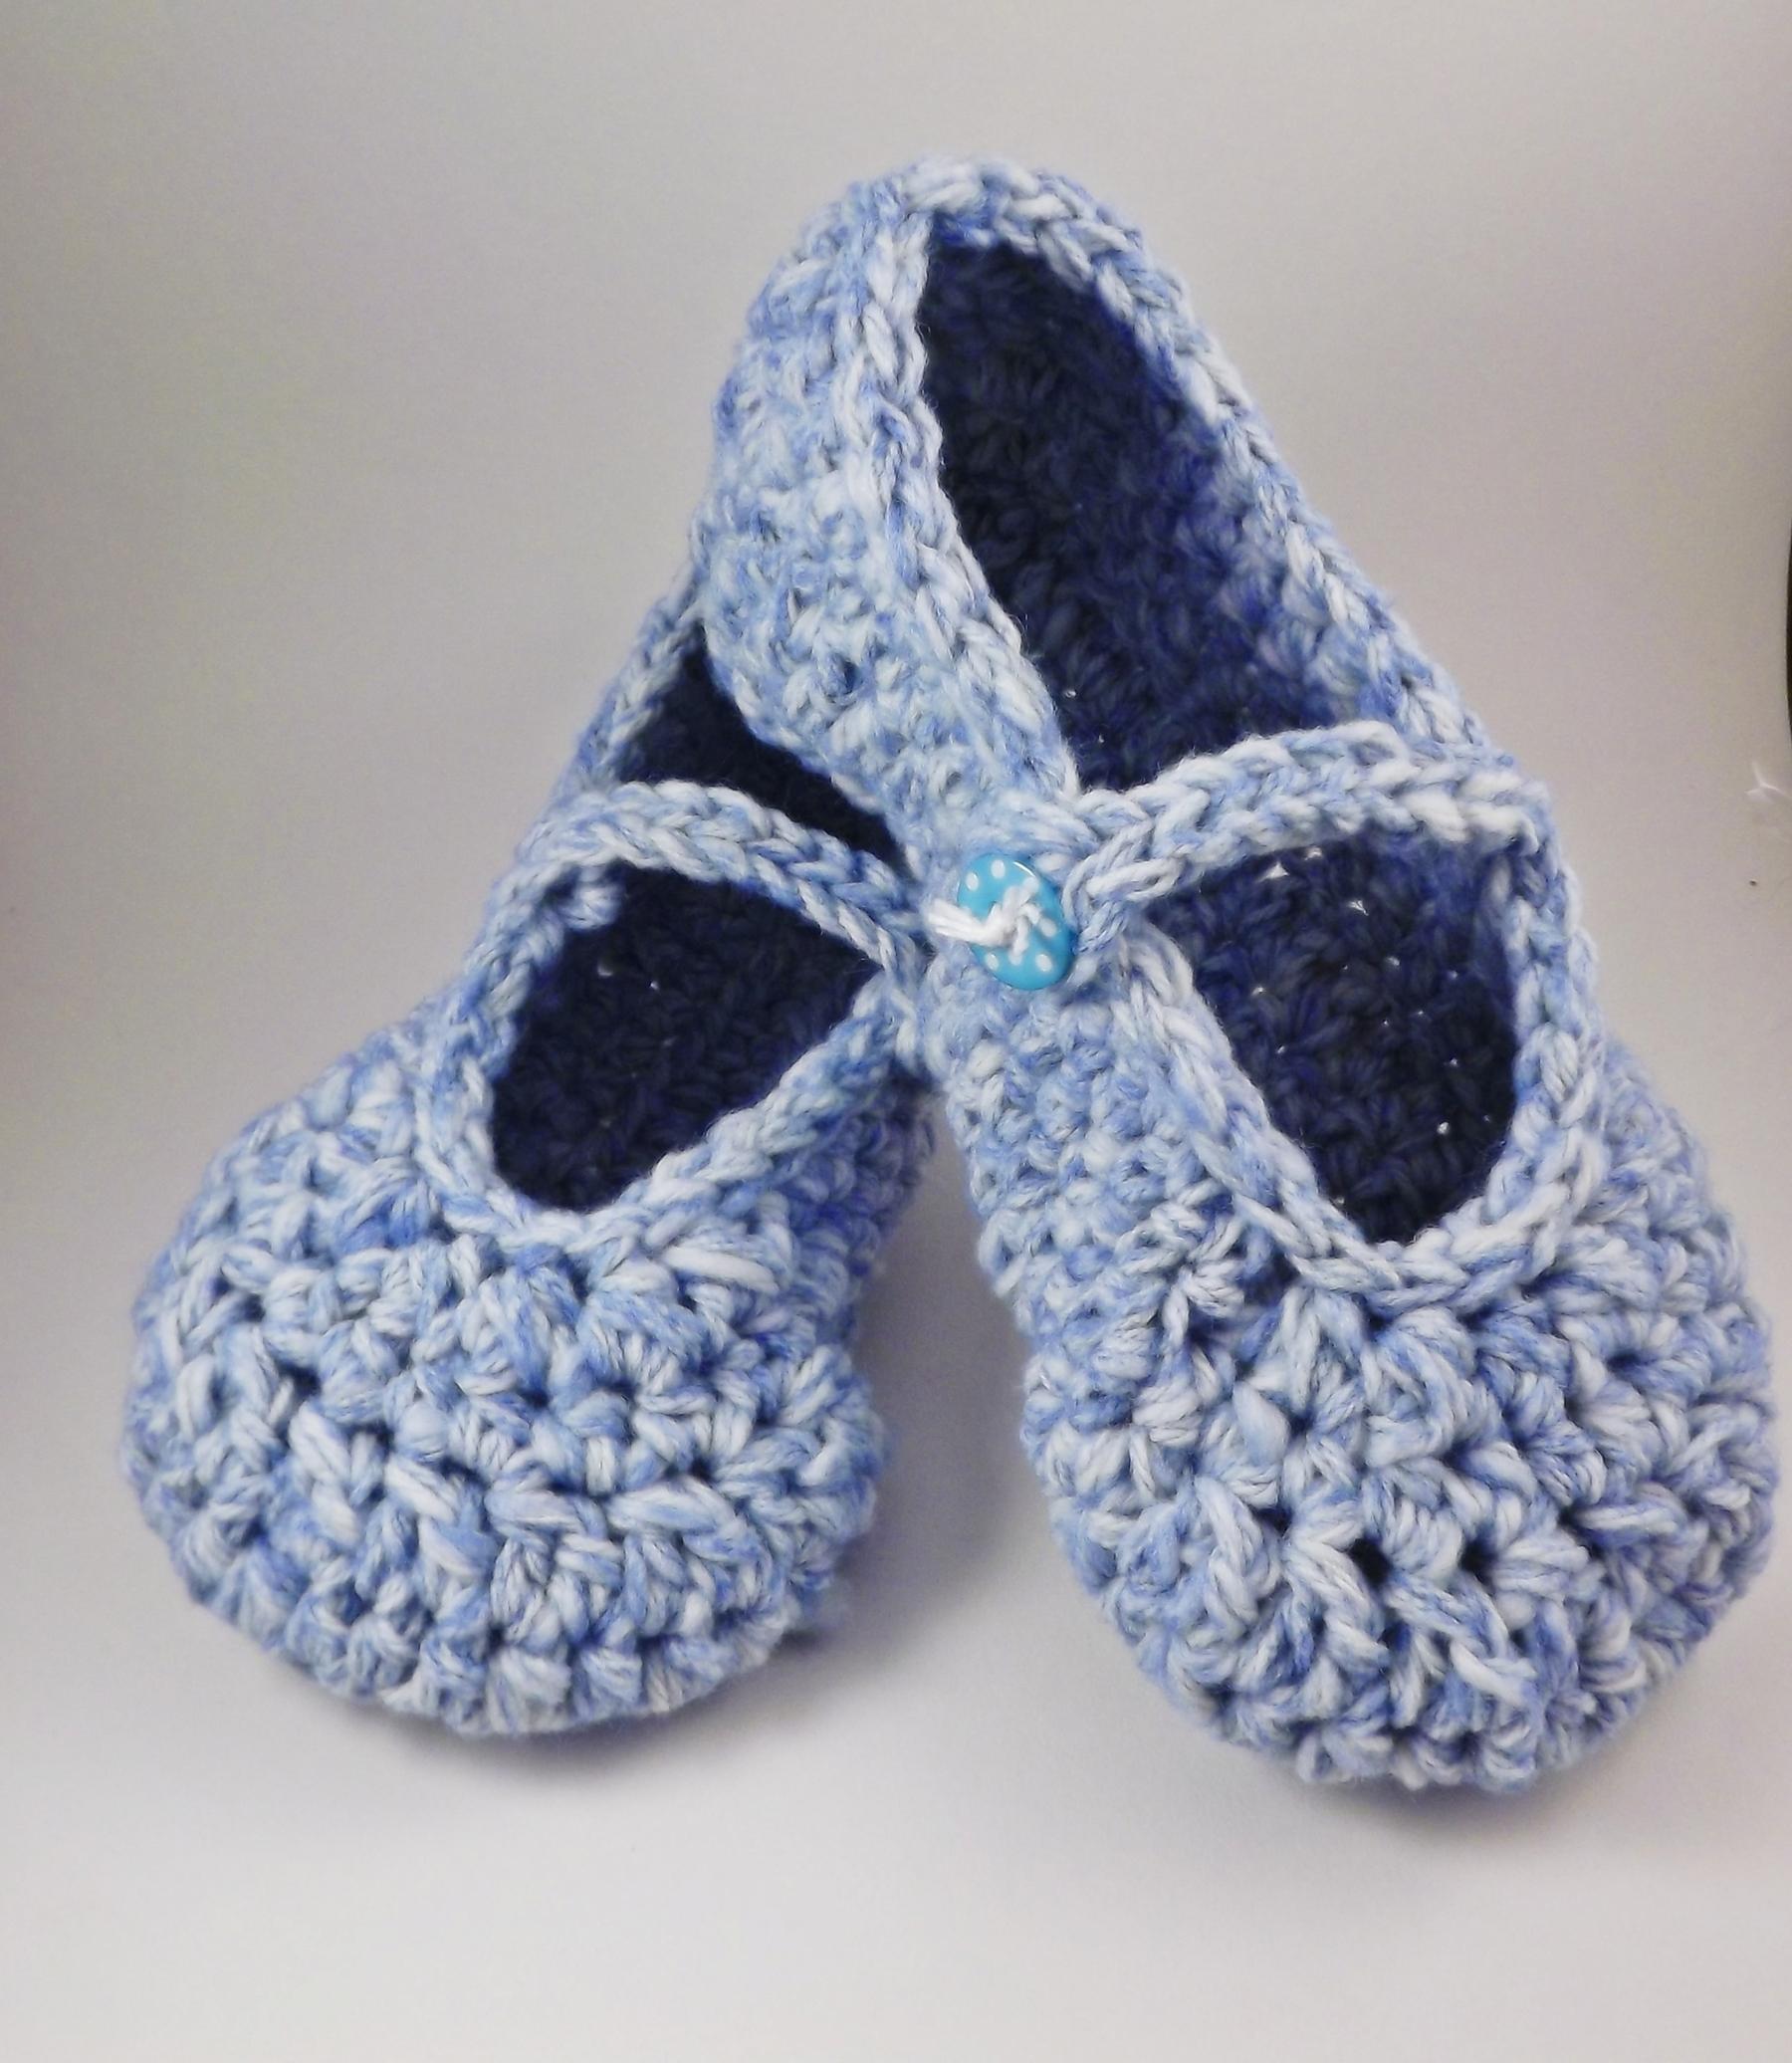 Mary Jane Slippers Crochet For Women Blue And White On Luulla